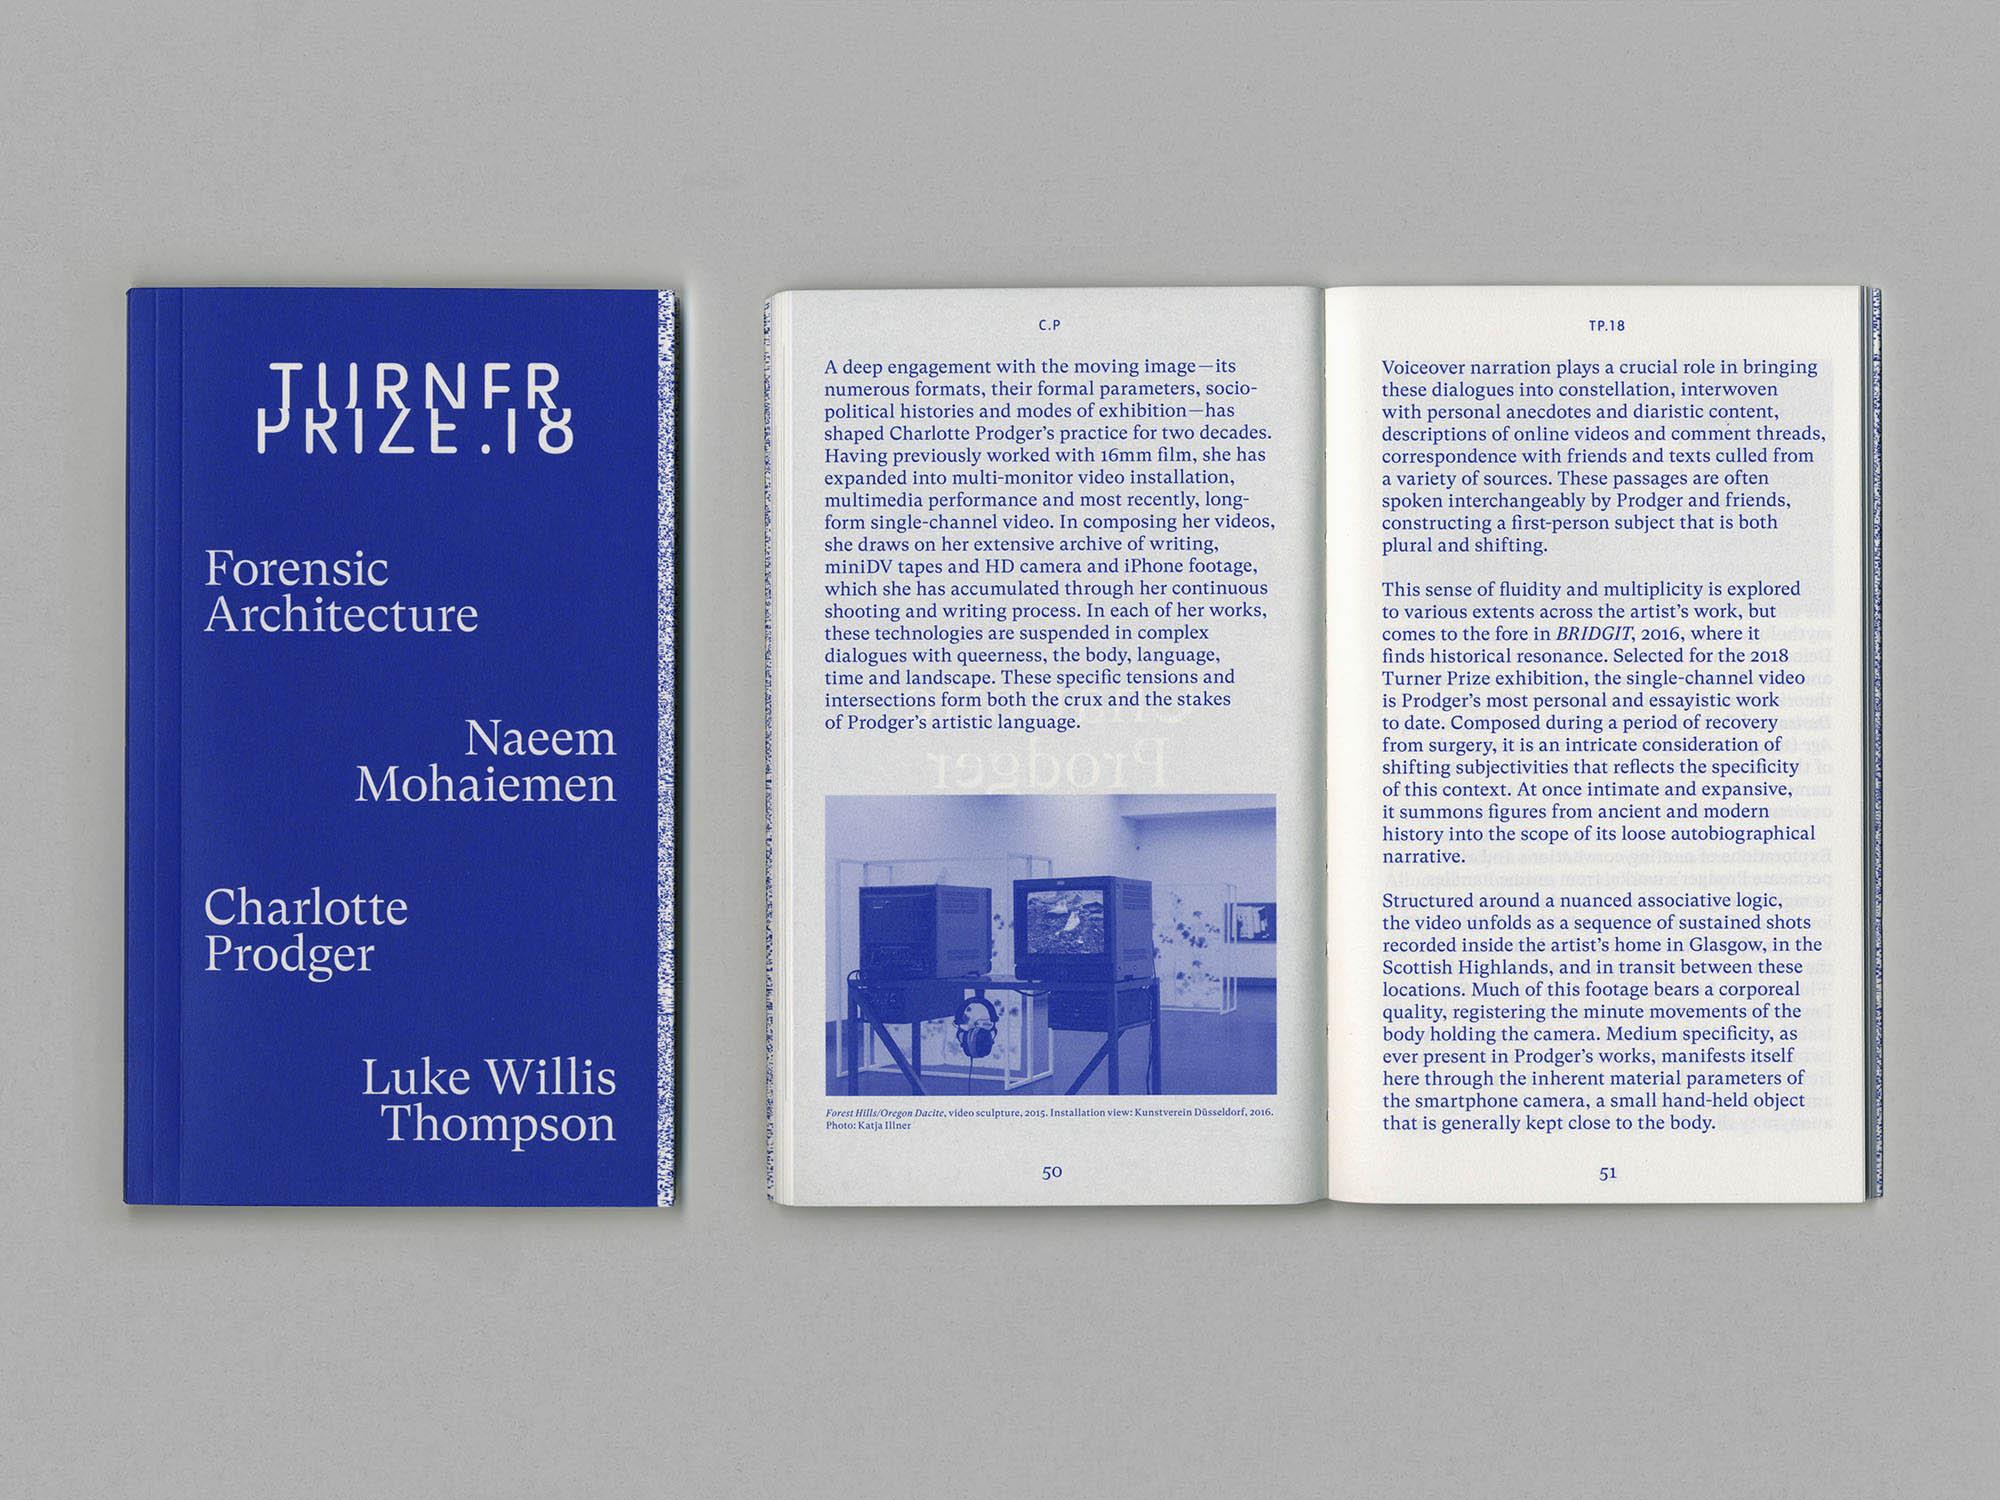 Turner Prize 18 Tate Britain exhibition catalogue